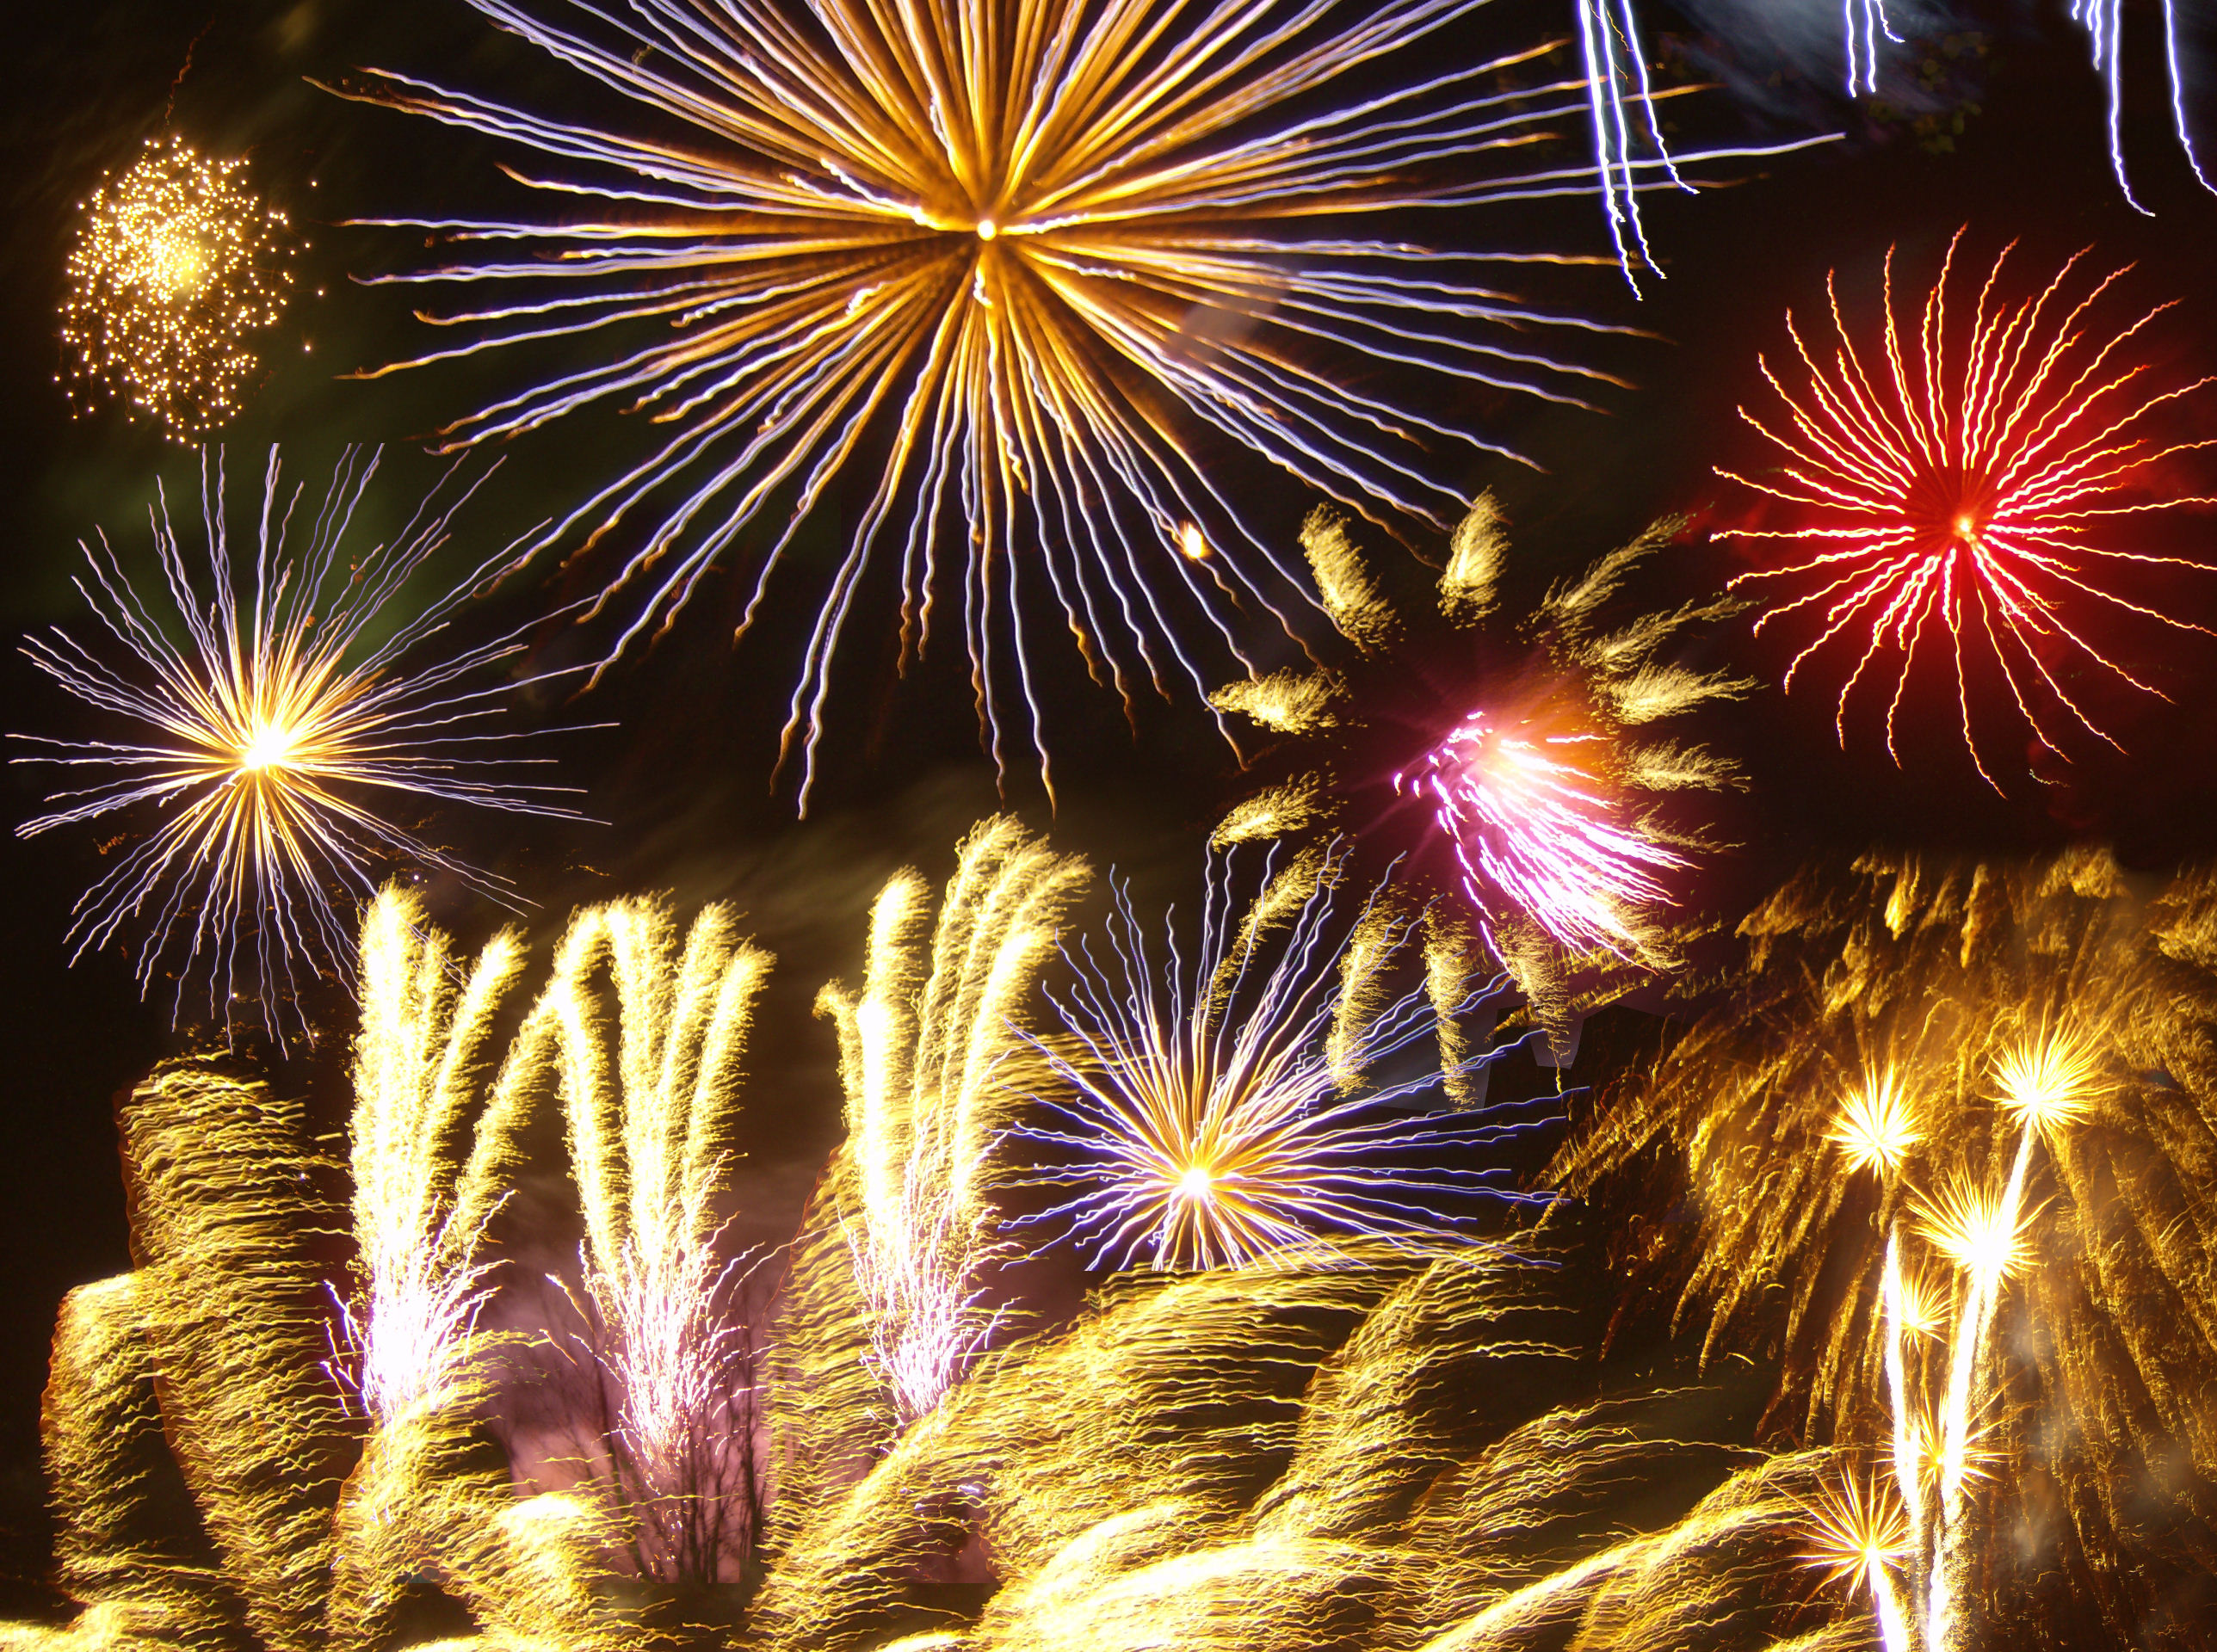 File:Firework photomontage.jpg - Wikimedia Commons